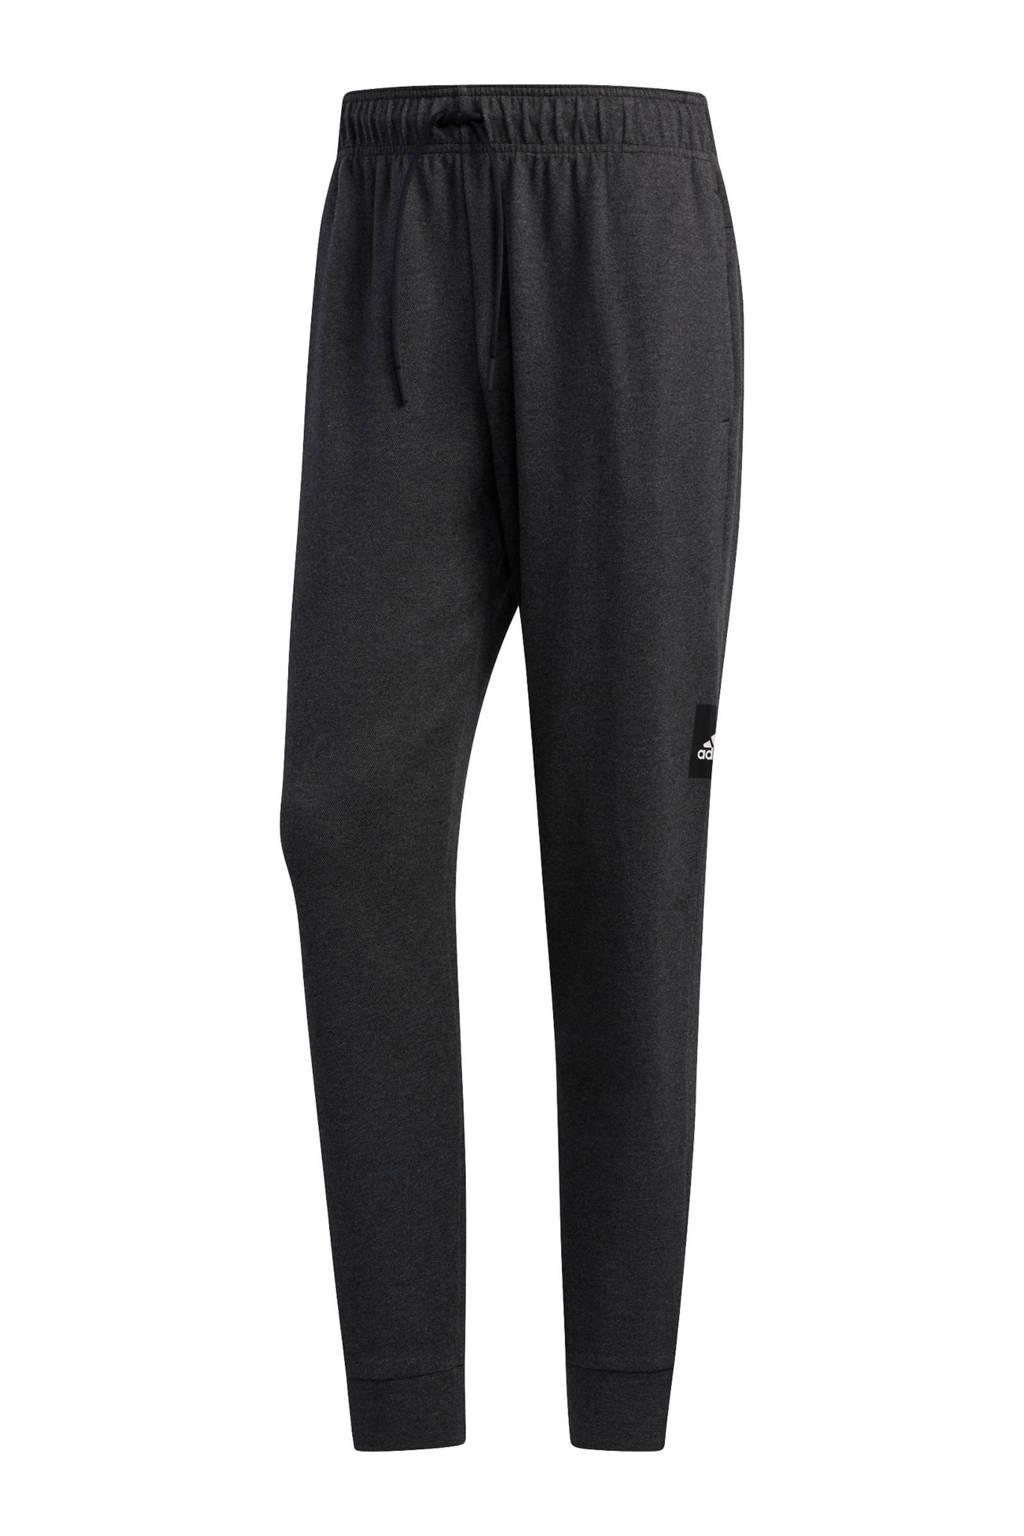 adidas joggingbroek zwart, Zwart